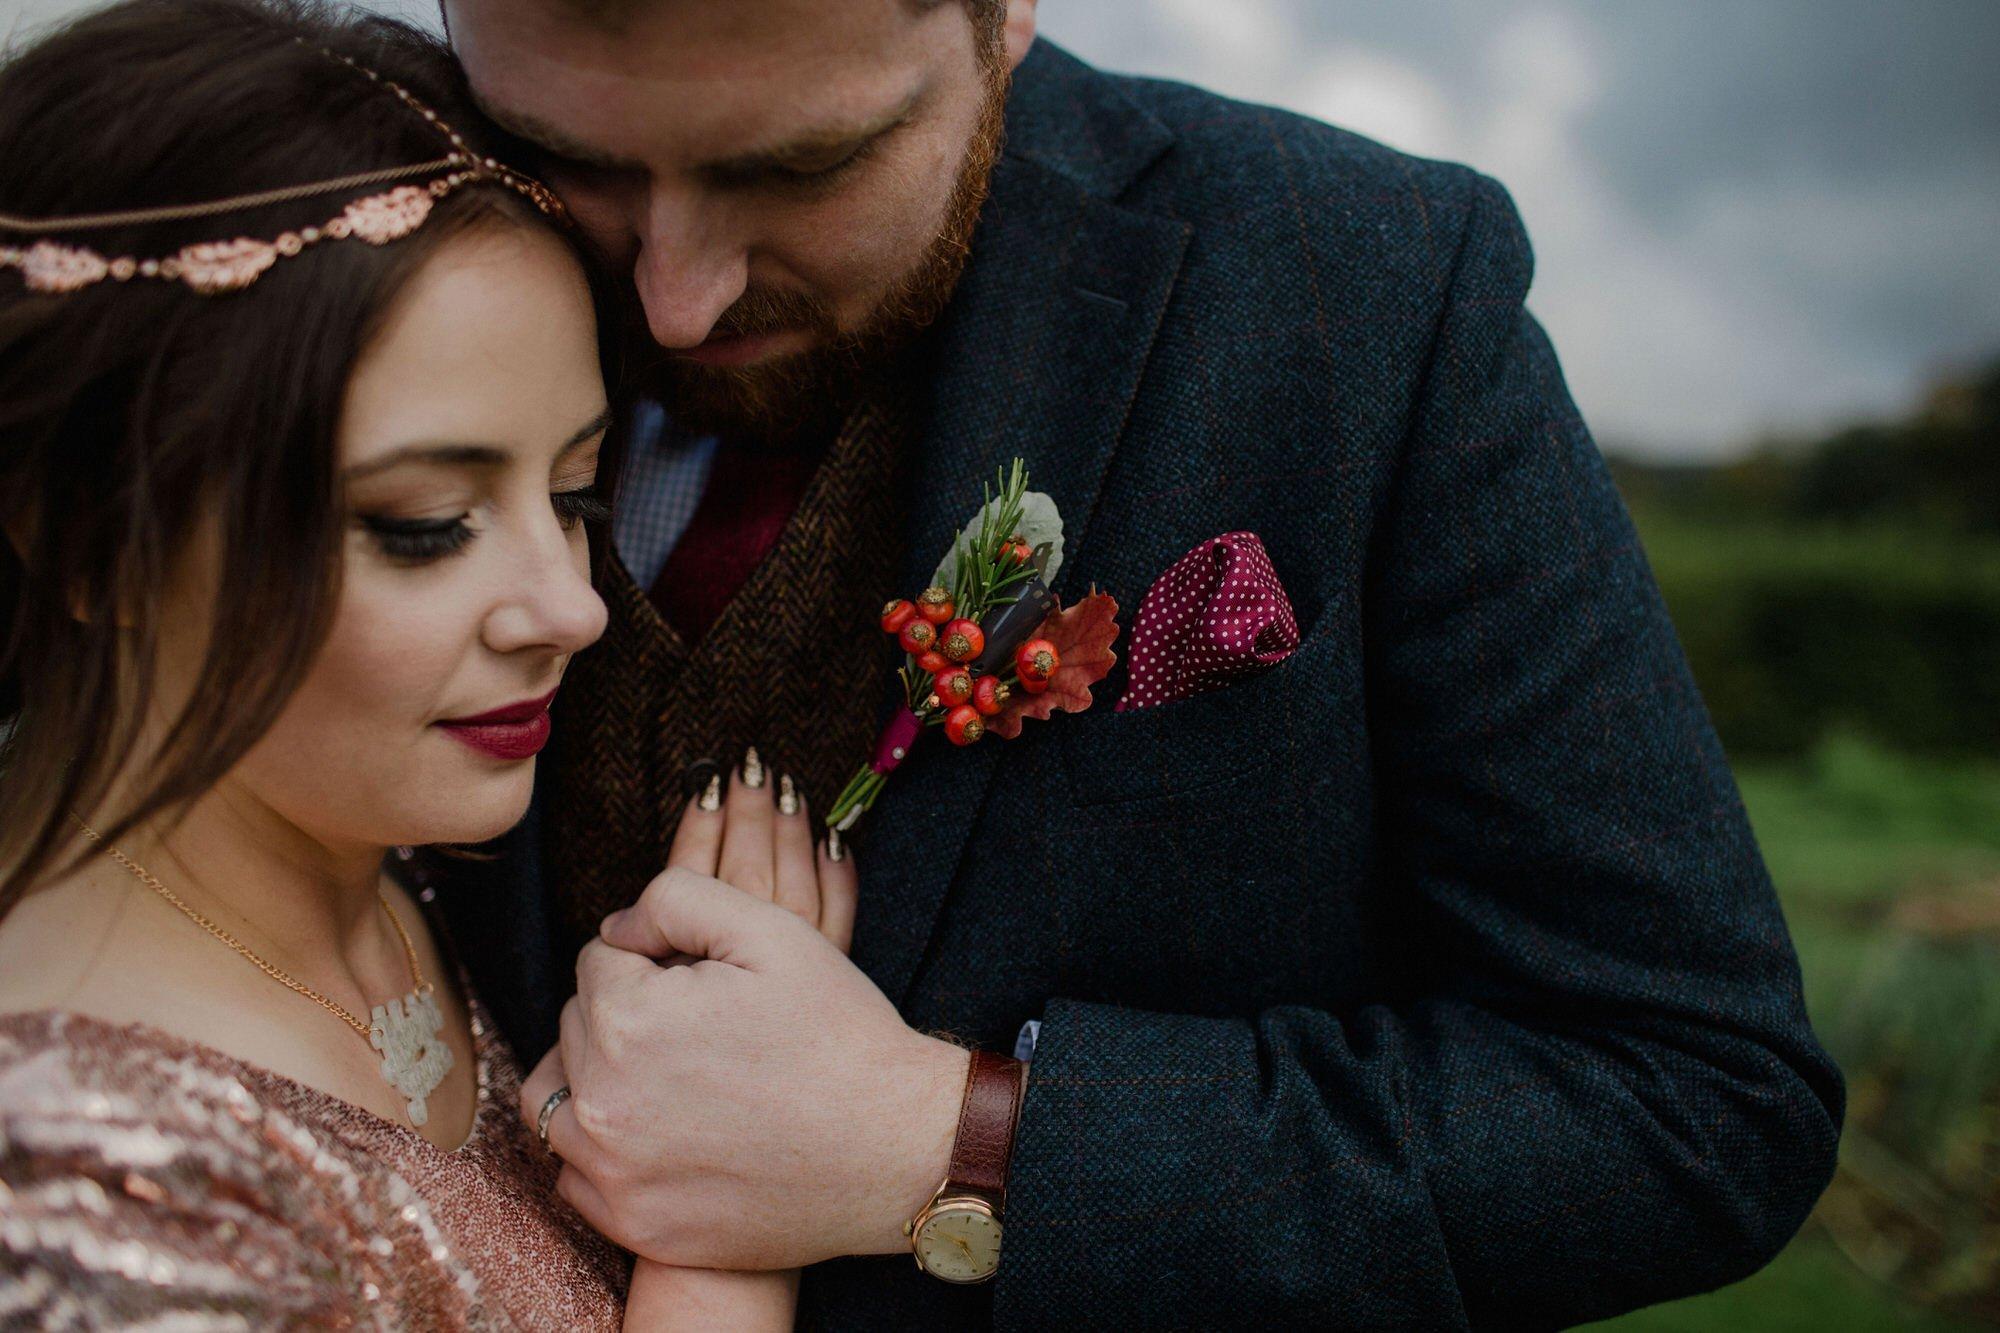 054 TIN SHED KNOCKRAICH FARM WEDDING ALTERNATIVE BRIDE ZOE ALEXANDRA PHOTOGRAPHY